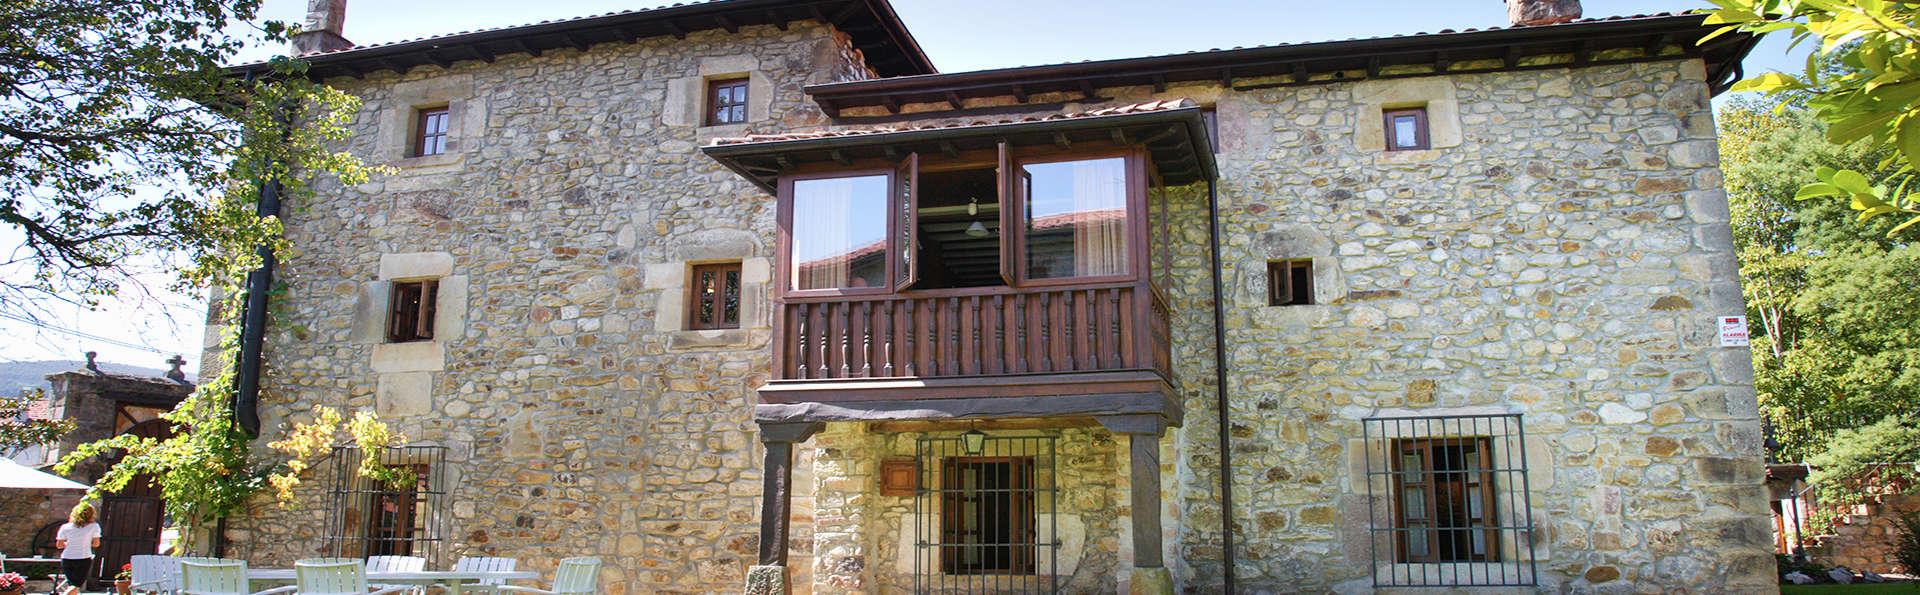 Posada La Torre de la Quintana - EDIT_1_FACHADA.jpg